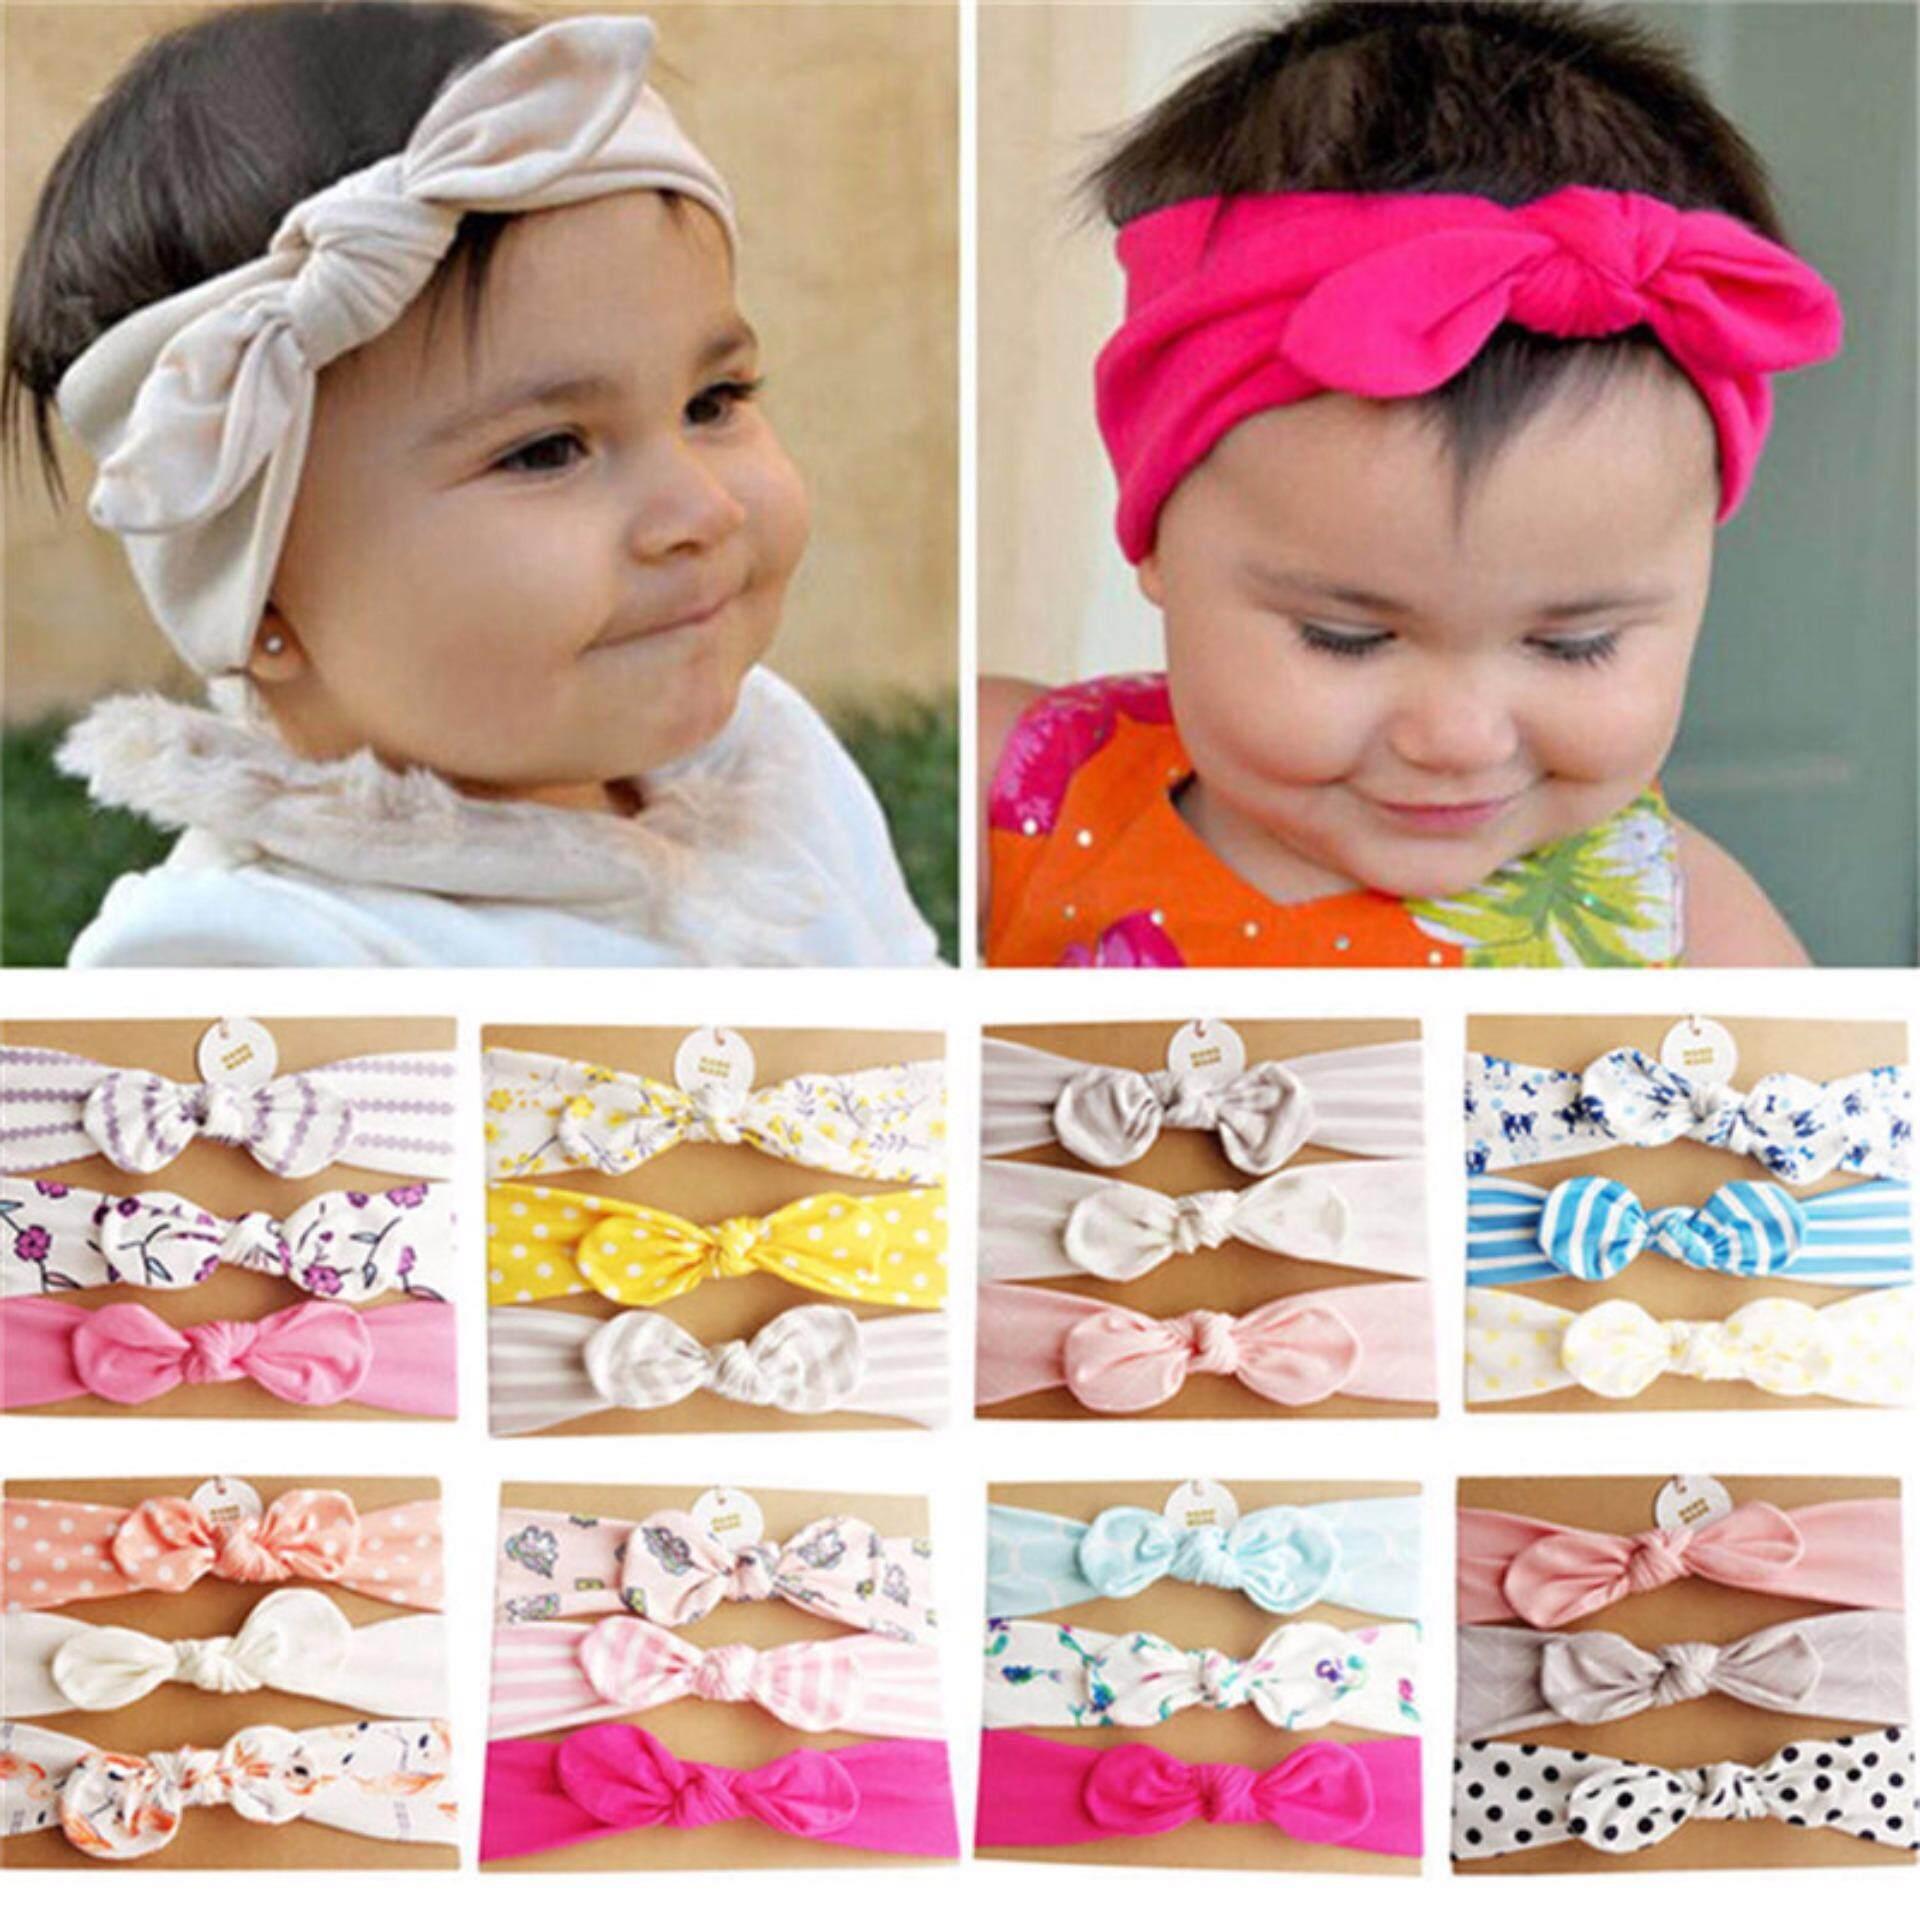 5a816f3e15f 3pcs/Set Kids Girls Baby Headband Unicorn Mermaid Flower Hair Band 2018 New  A1